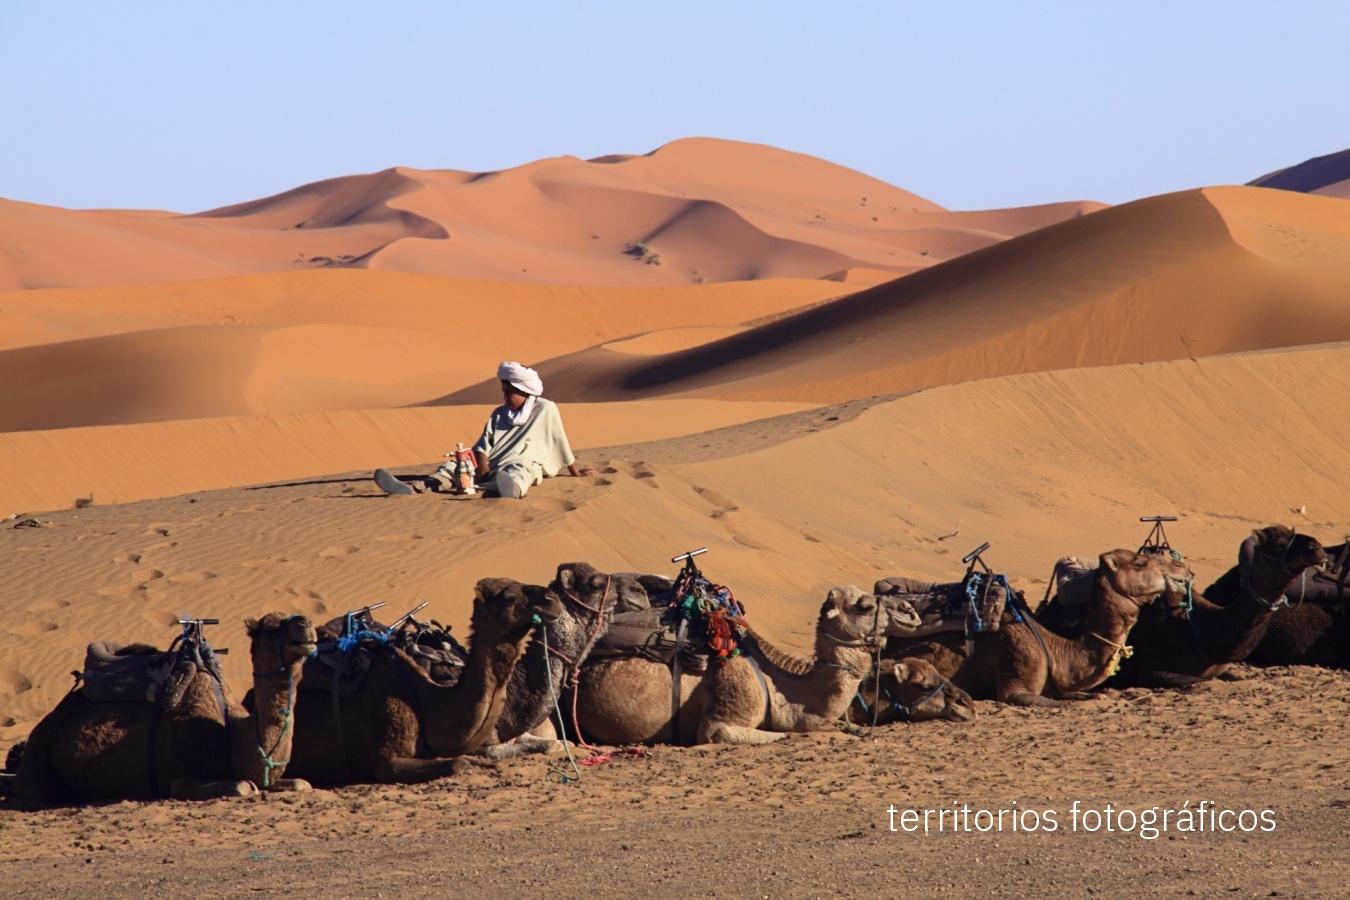 luces africanas Marruecos - territorios fotográficos